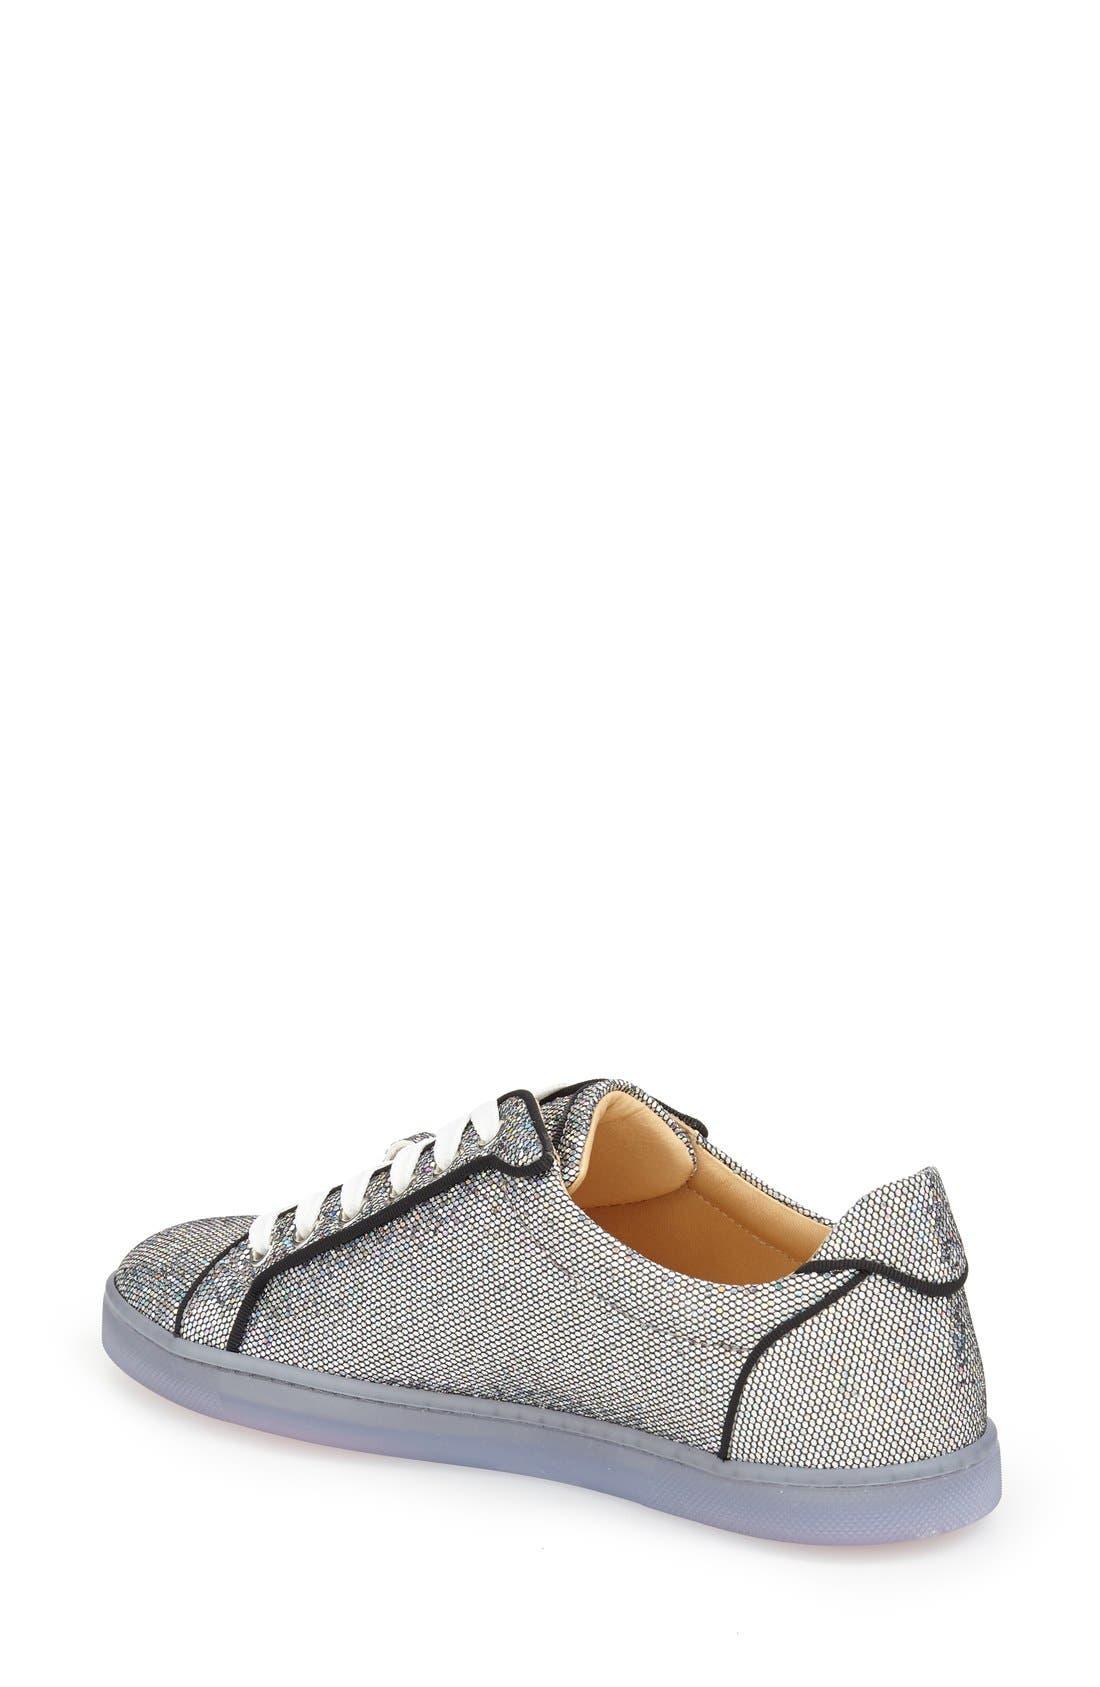 'Seava' Disco Ball Glitter Sneaker,                             Alternate thumbnail 2, color,                             040